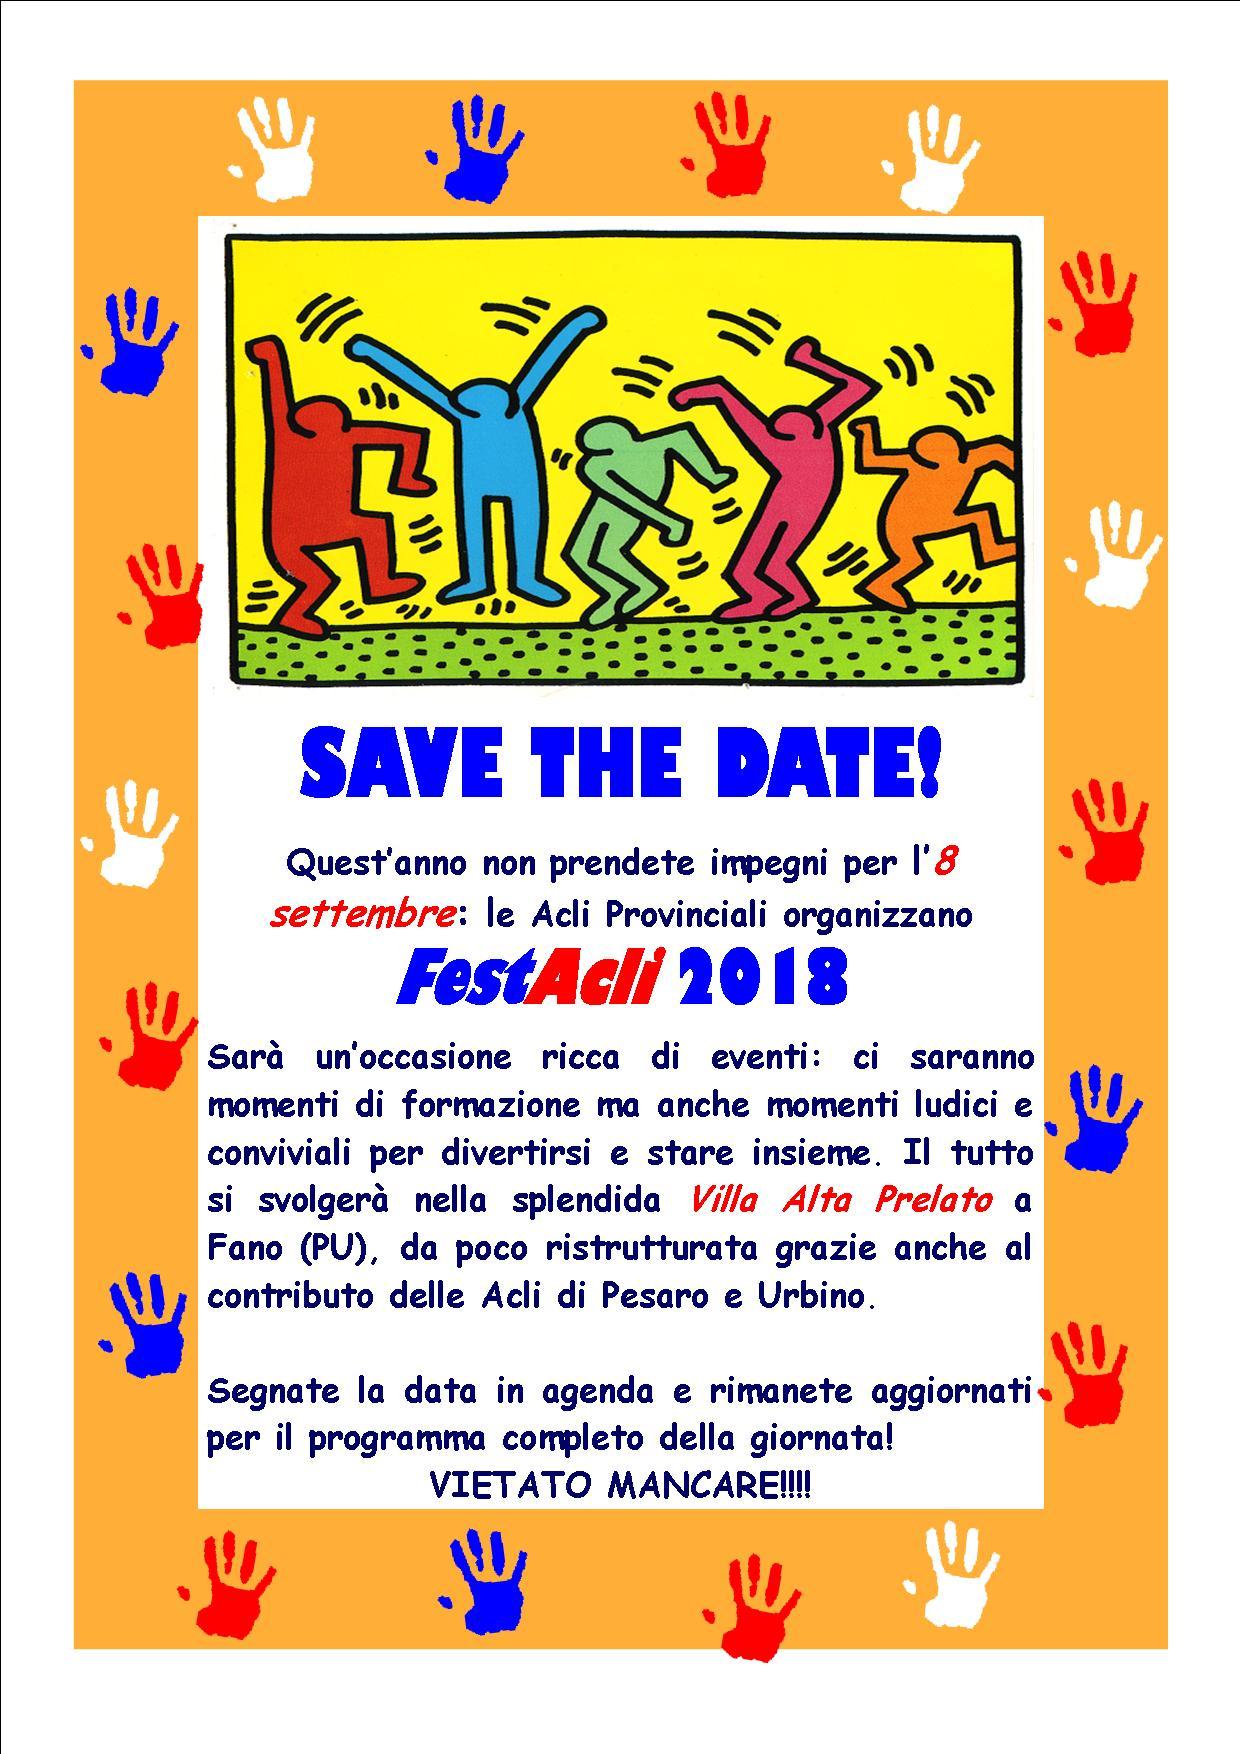 Volantino FestAcli 2018 immagine